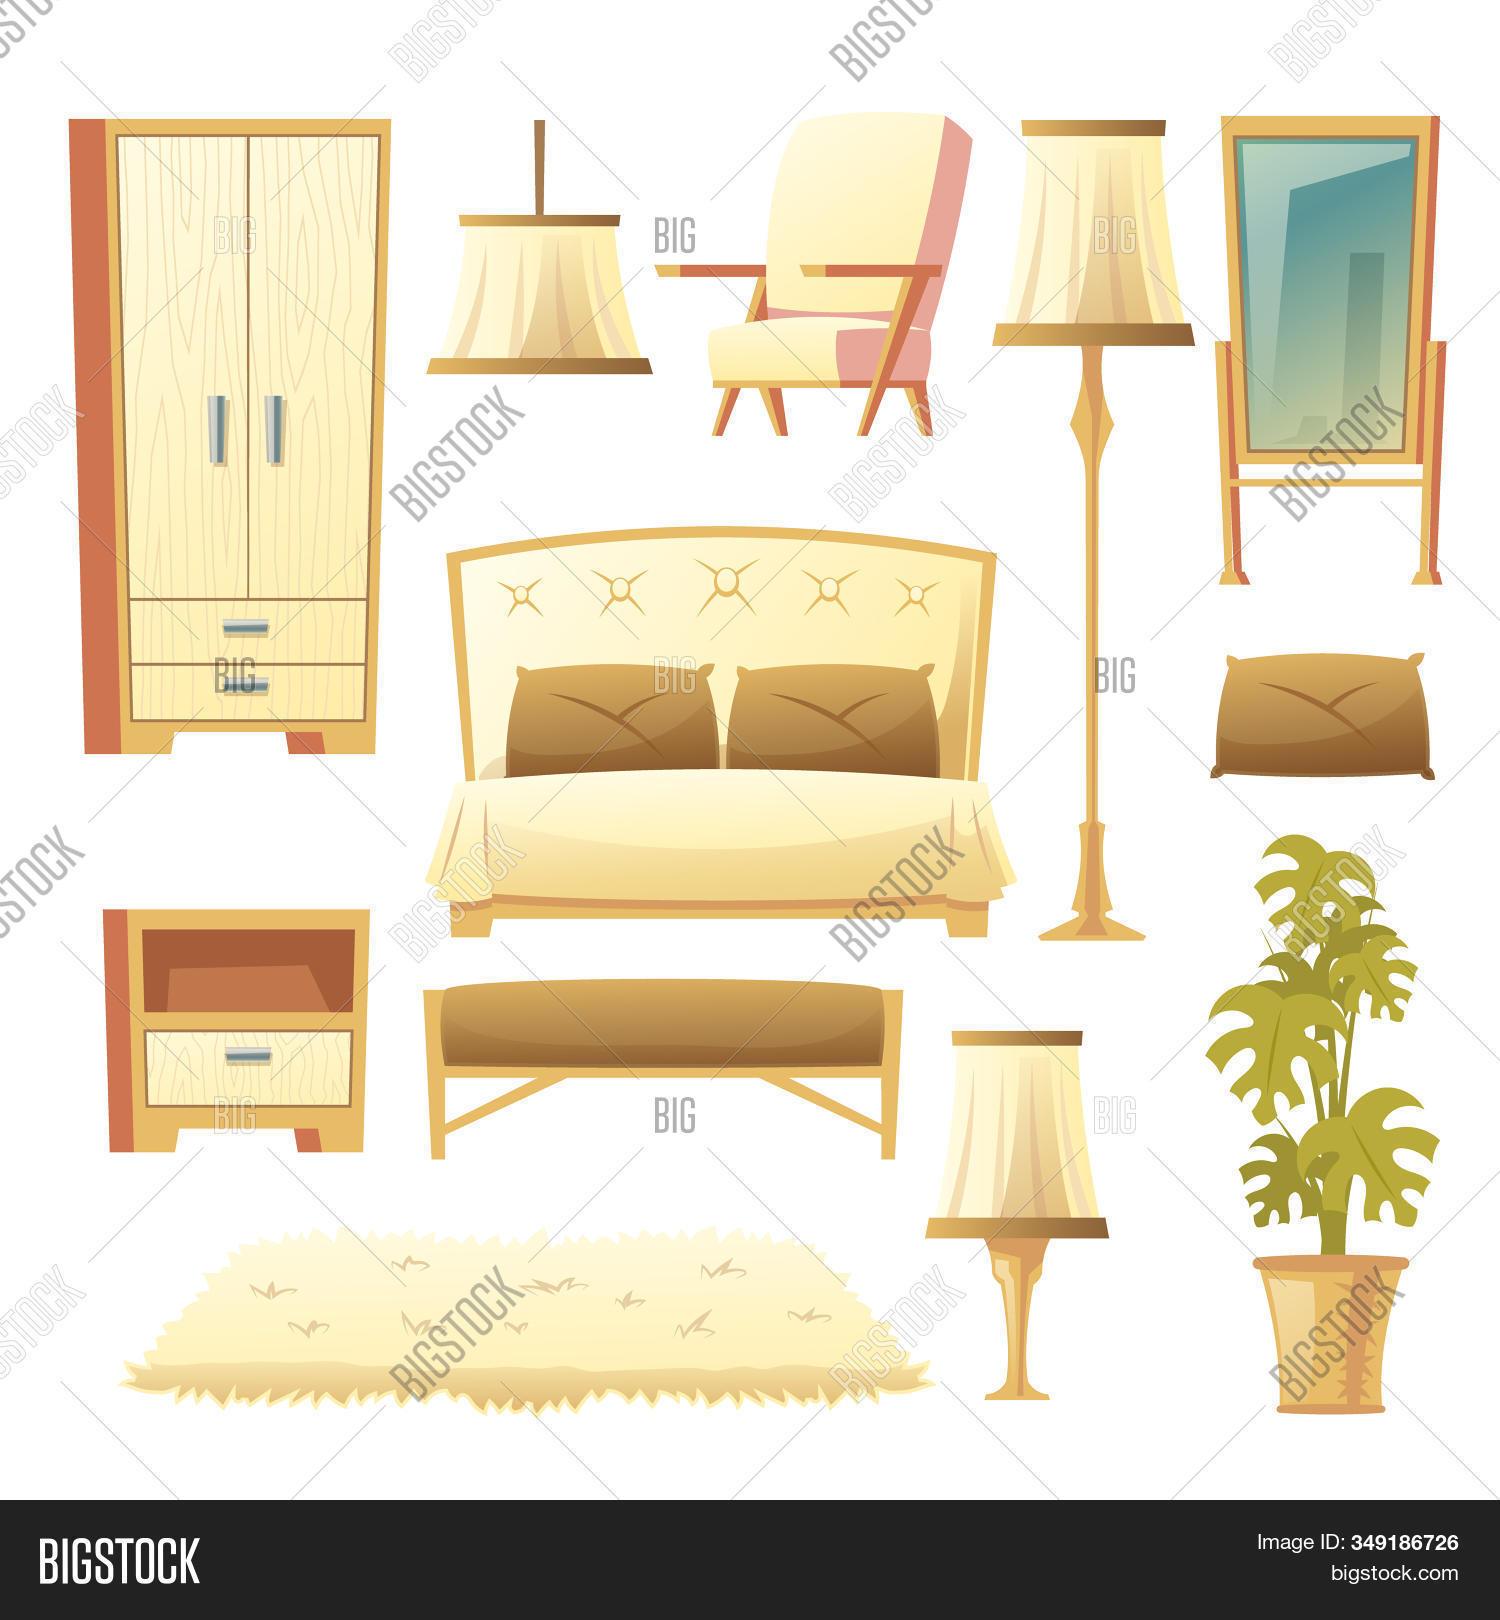 Cartoon Set Bedroom Image Photo Free Trial Bigstock